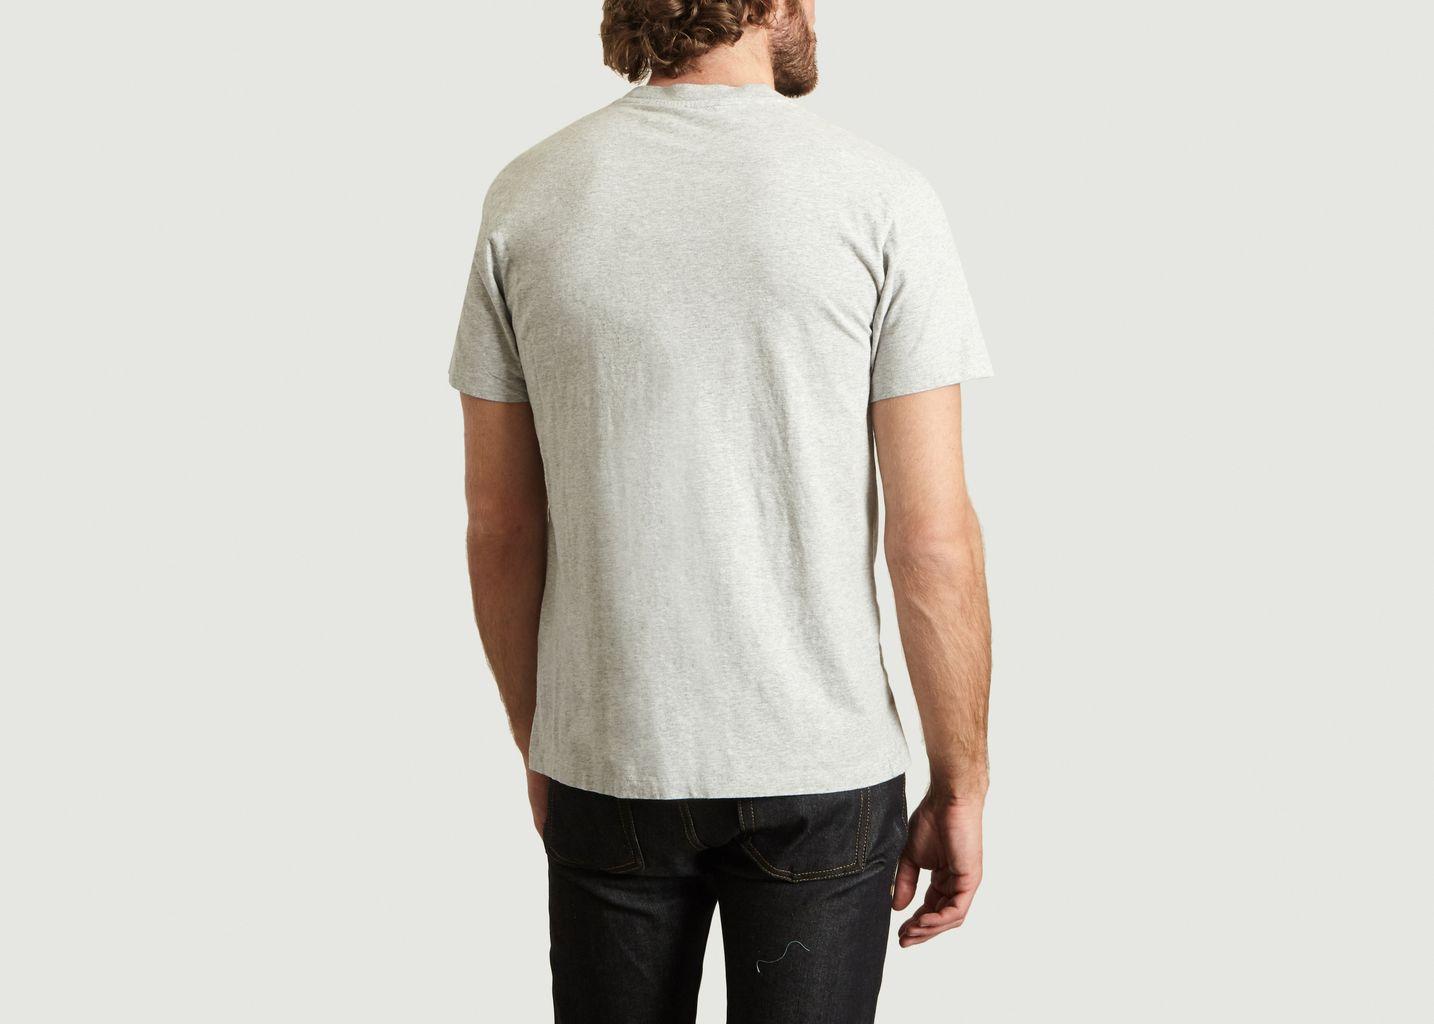 T-Shirt Lovebird - Maison Kitsuné